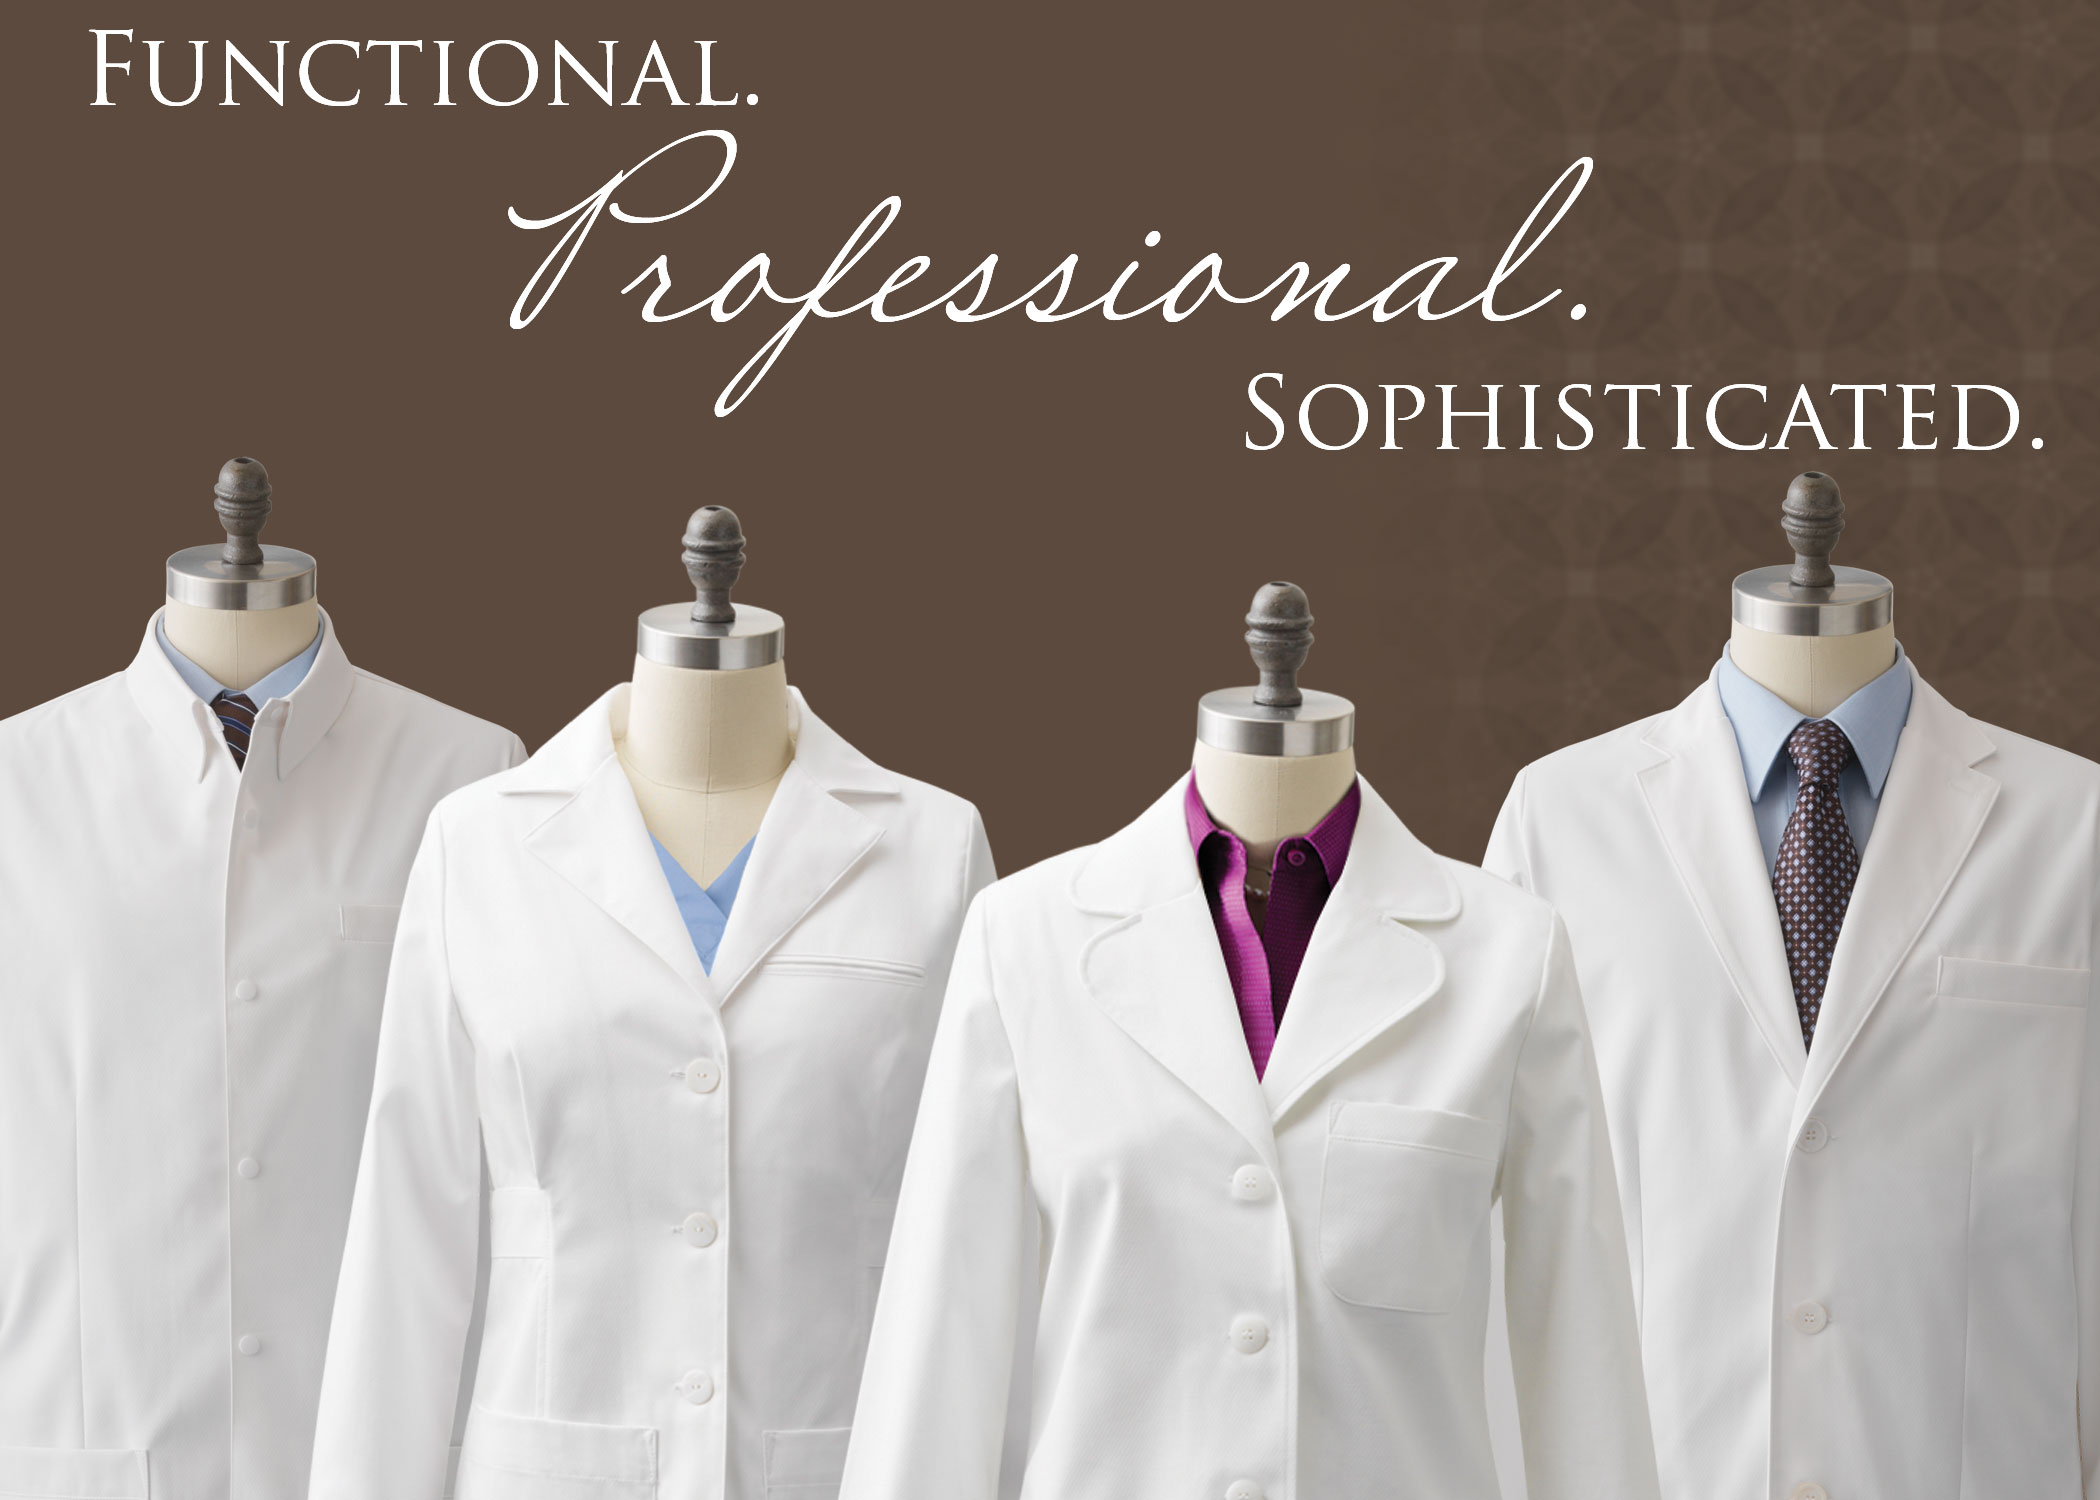 Shop Lab Coats Laboratory Coats and Discount Lab Jackets